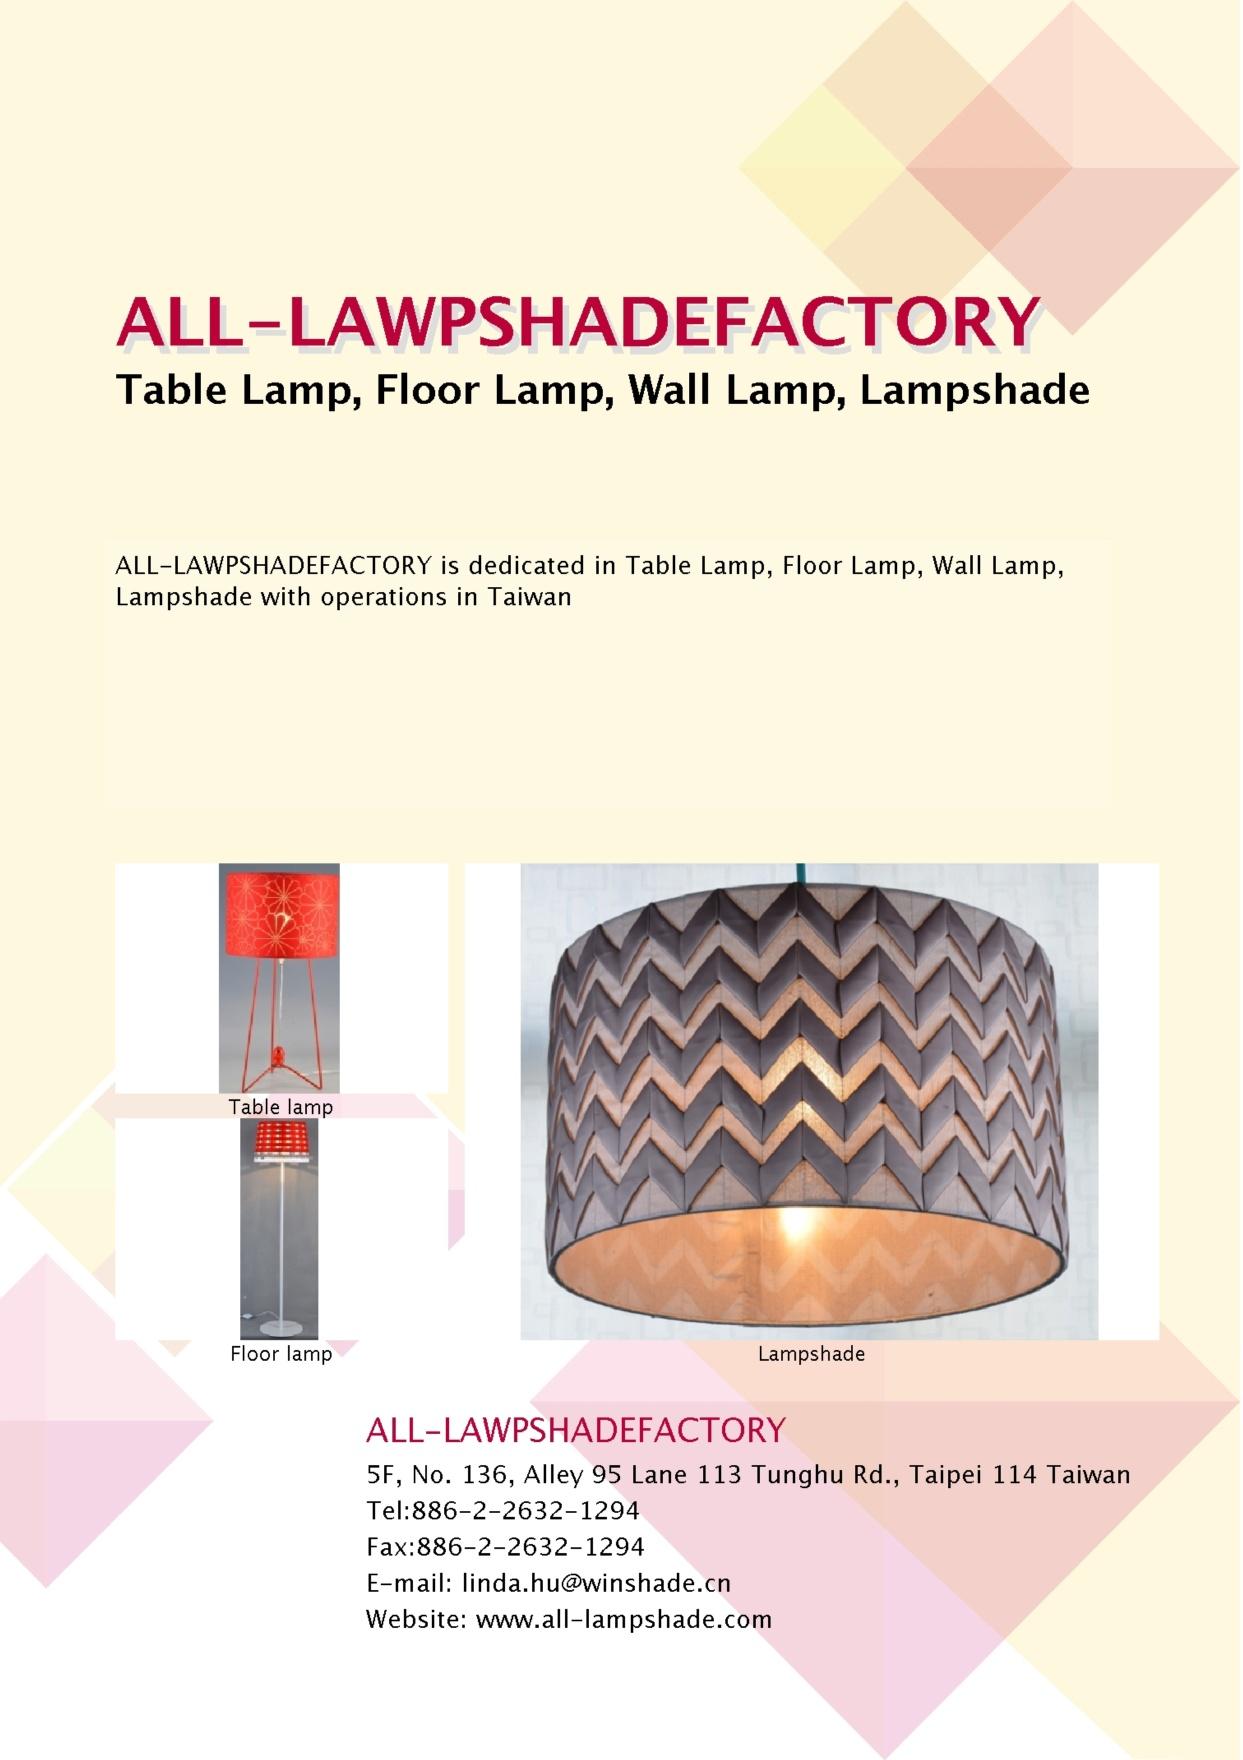 ALL-LAMPSHADE LIGHTING CO., LTD.